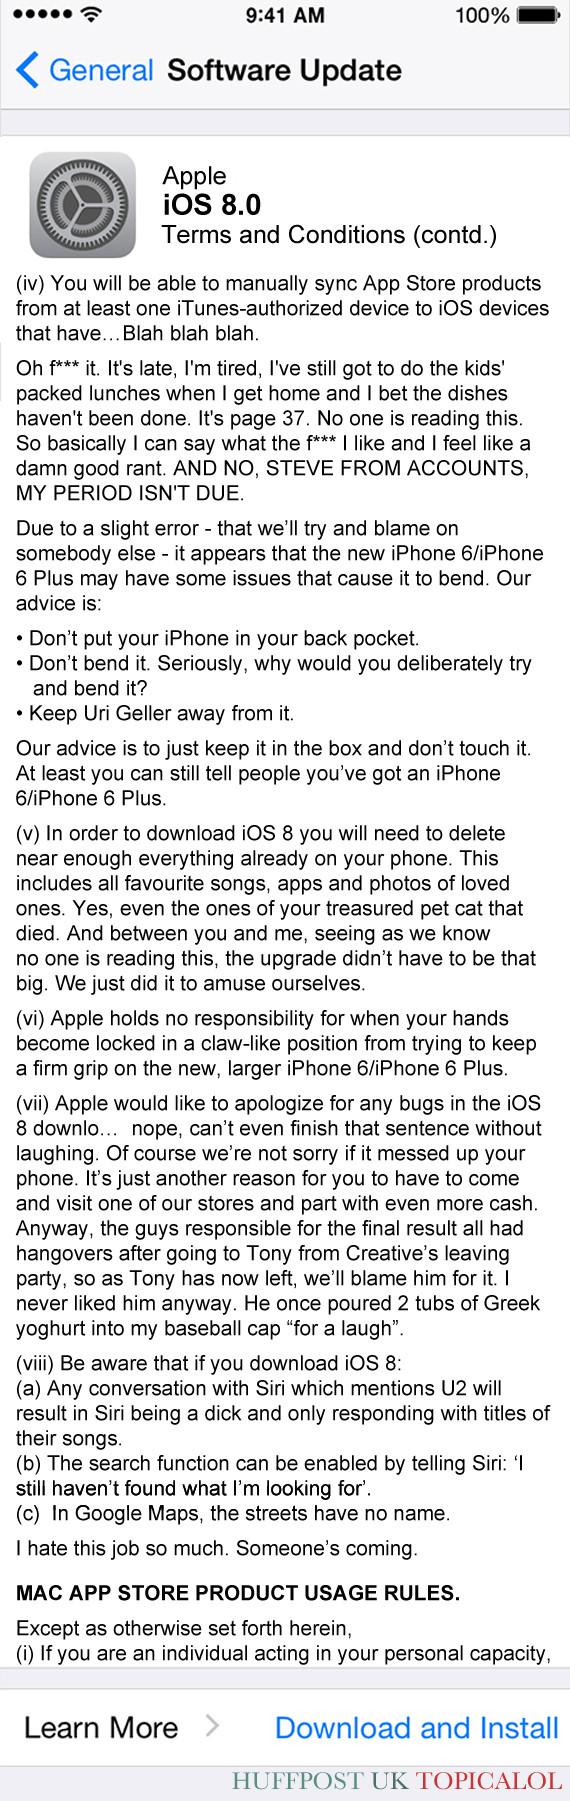 apple ios 8 spoof